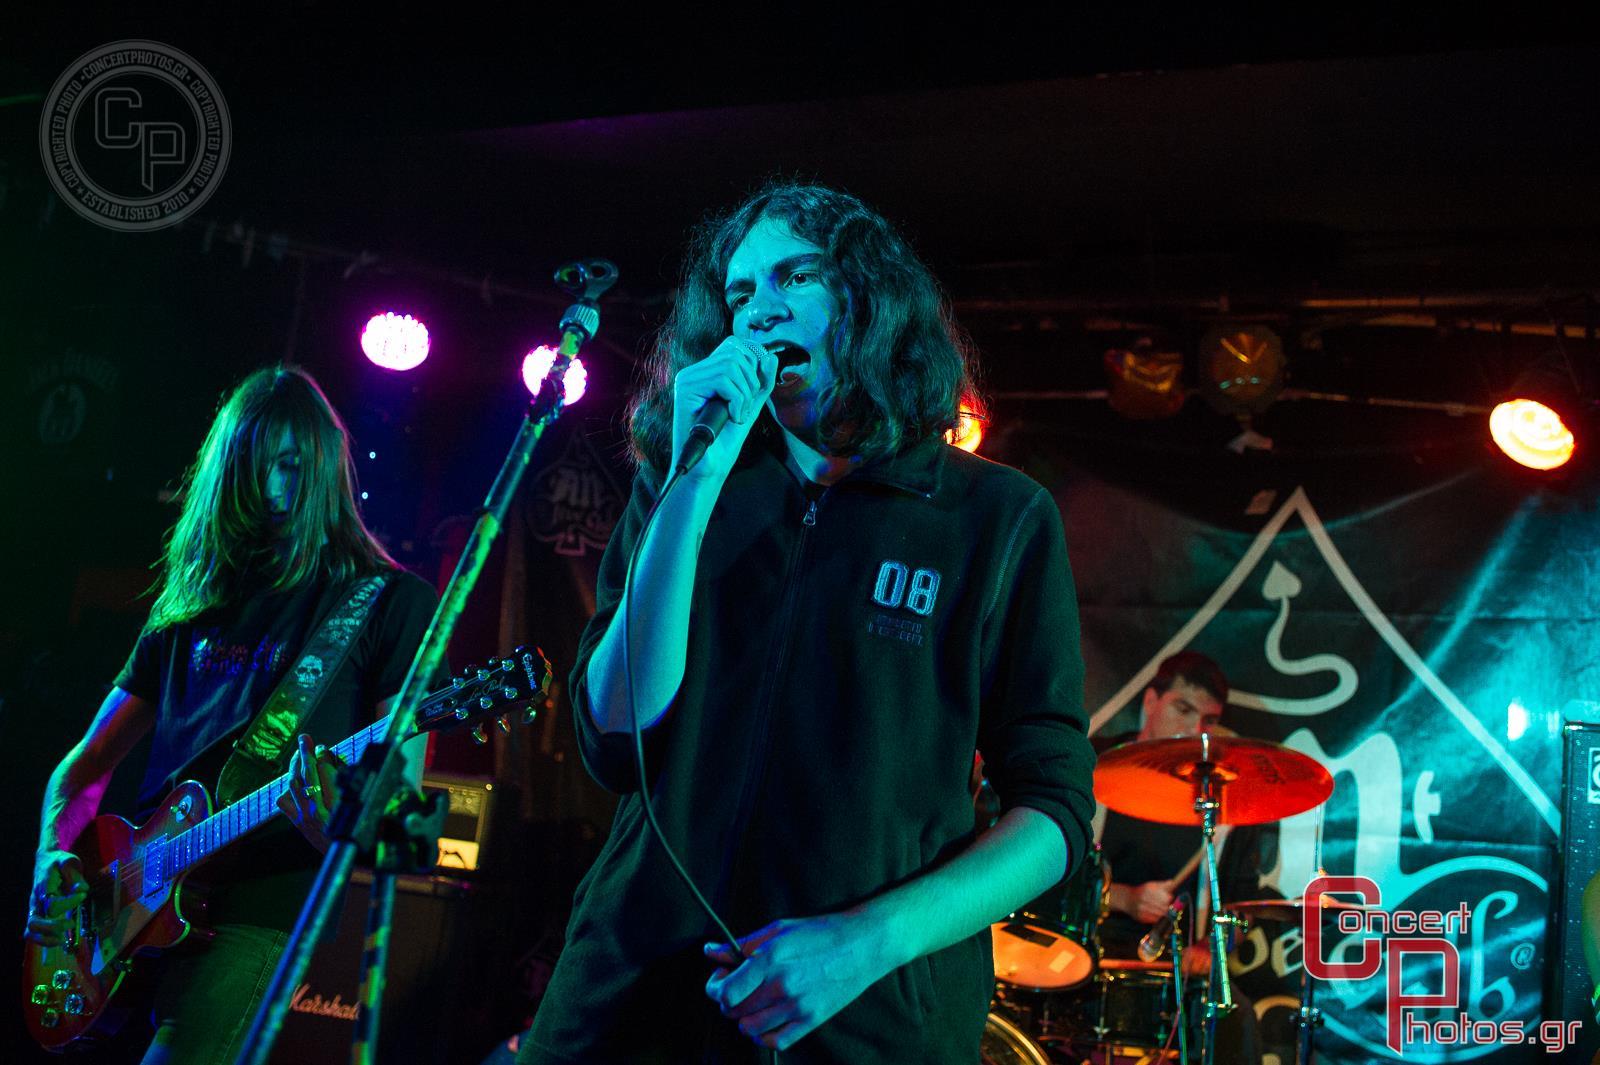 Battle Of The Bands Leg 1-Battle Of The Bands Leg 1 photographer:  - ConcertPhotos - 20141126_2256_45